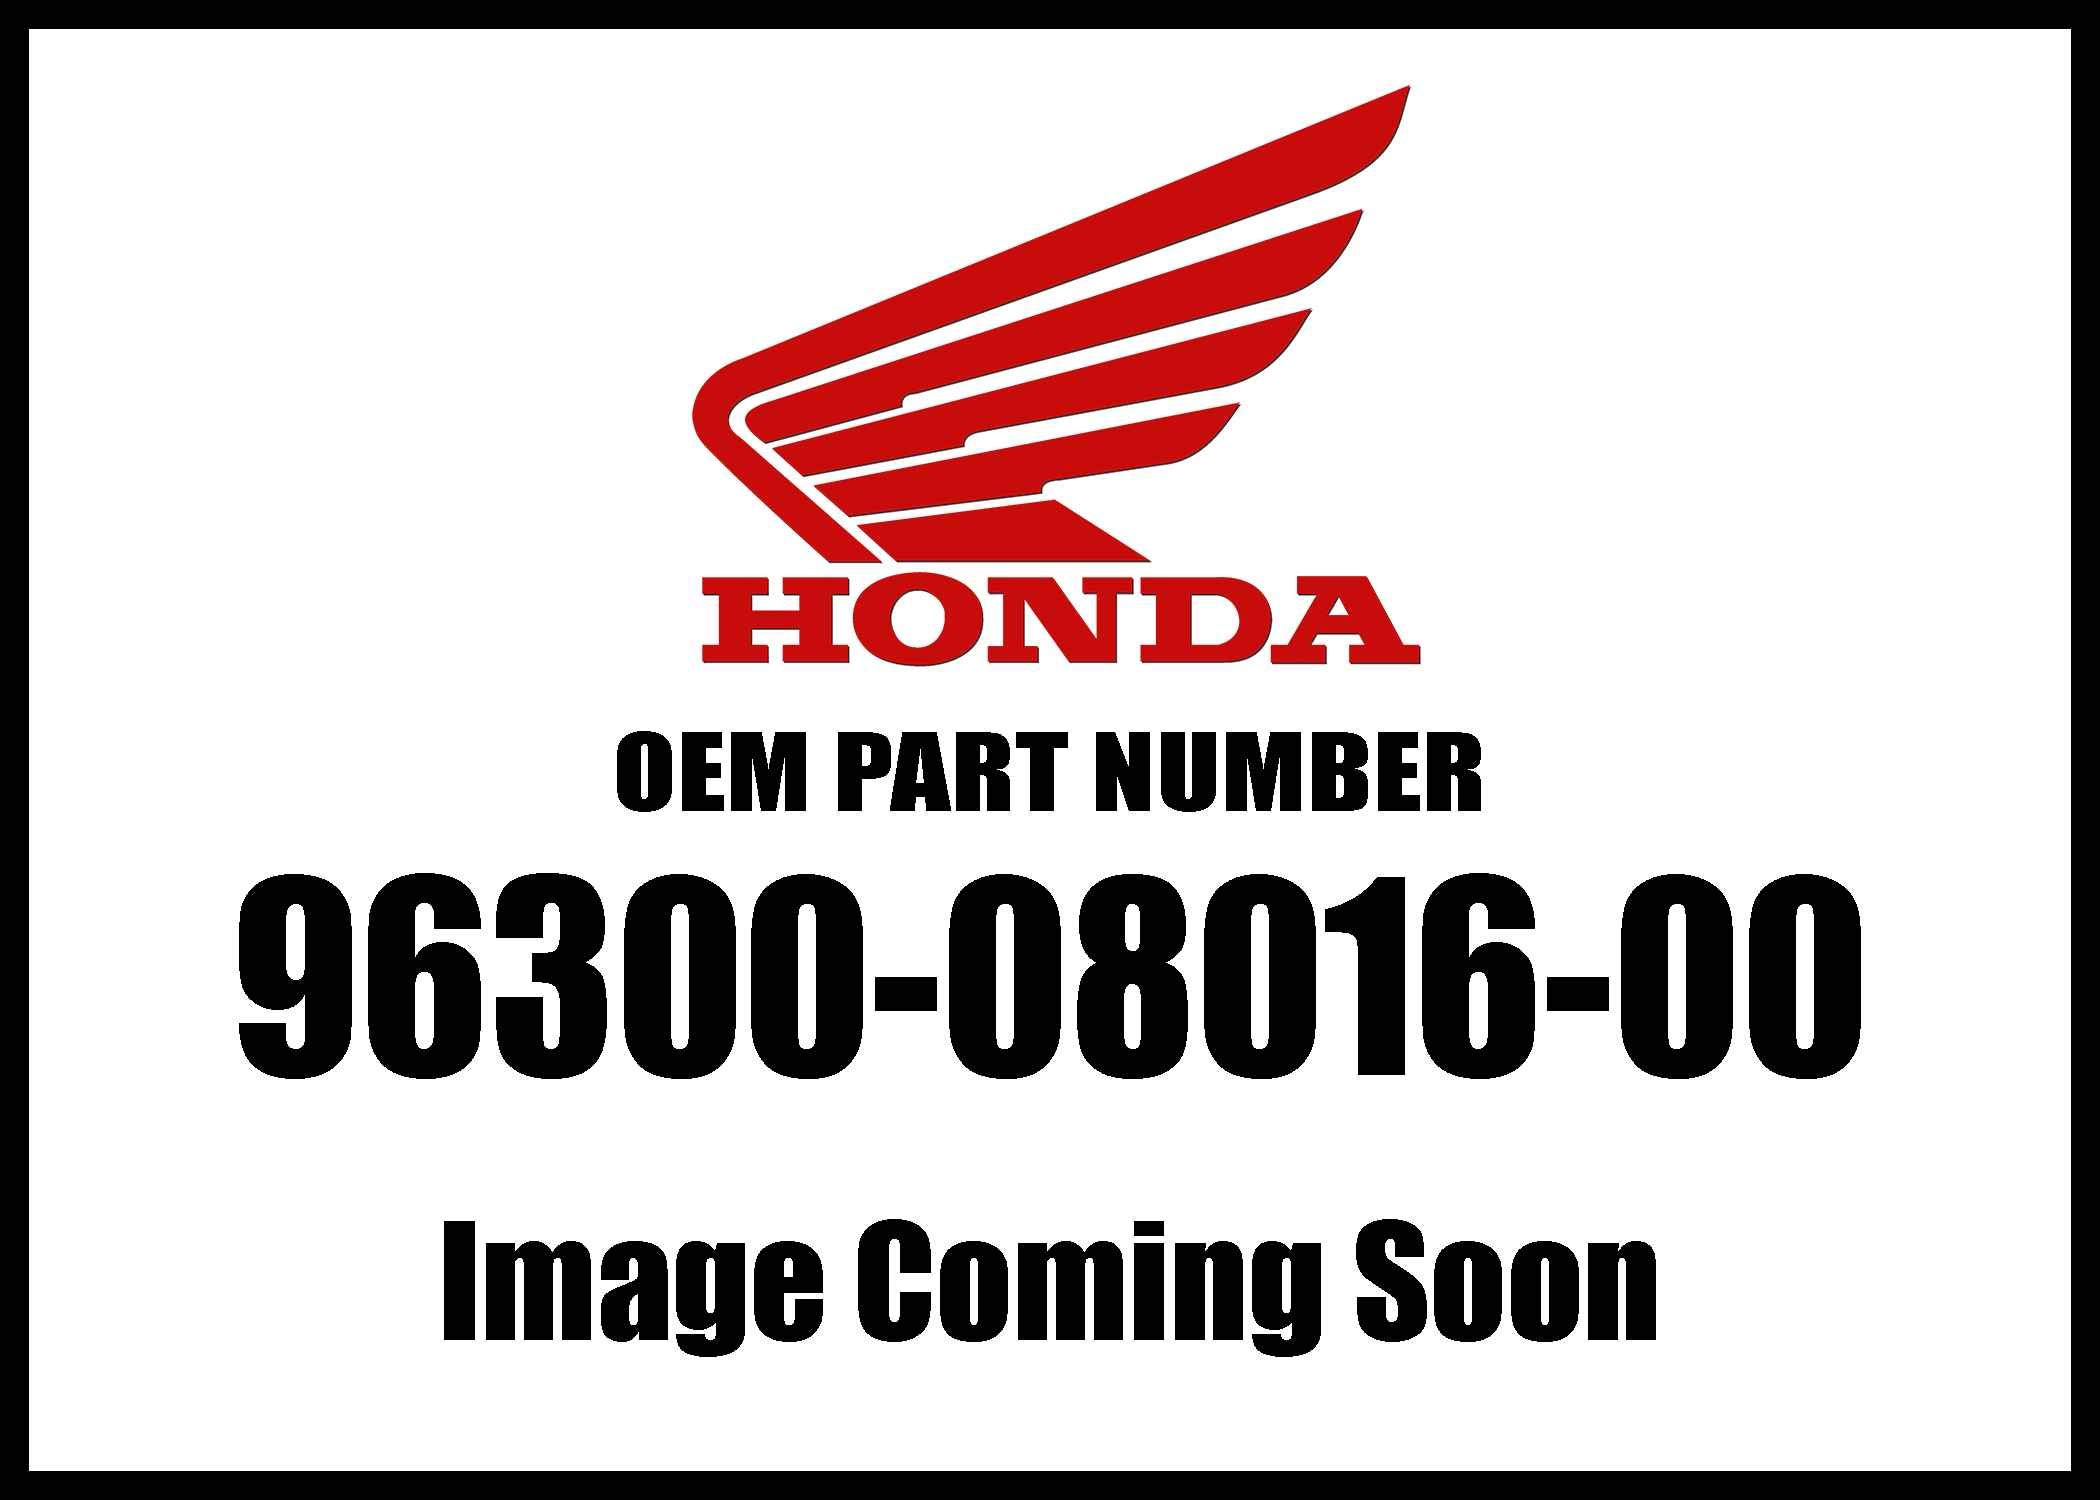 Honda 96300-08016-00 Bolt Genuine Original Equipment Manufacturer (OEM) Part by Honda (Image #1)